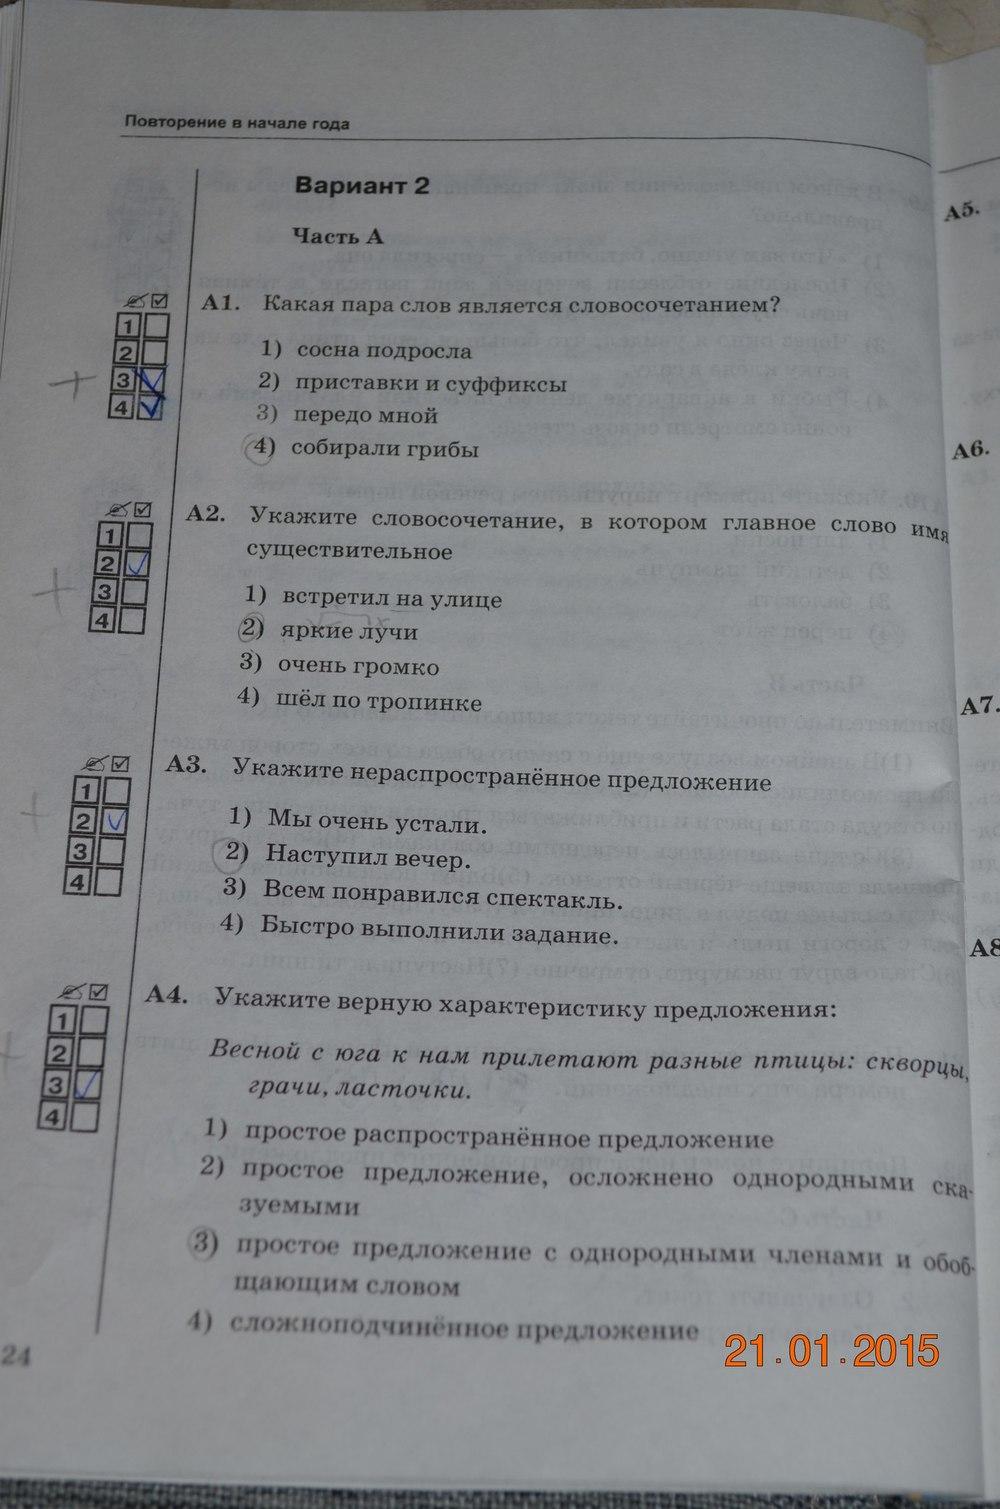 Гдз по русскому языку 5 класс ладыженская тесты